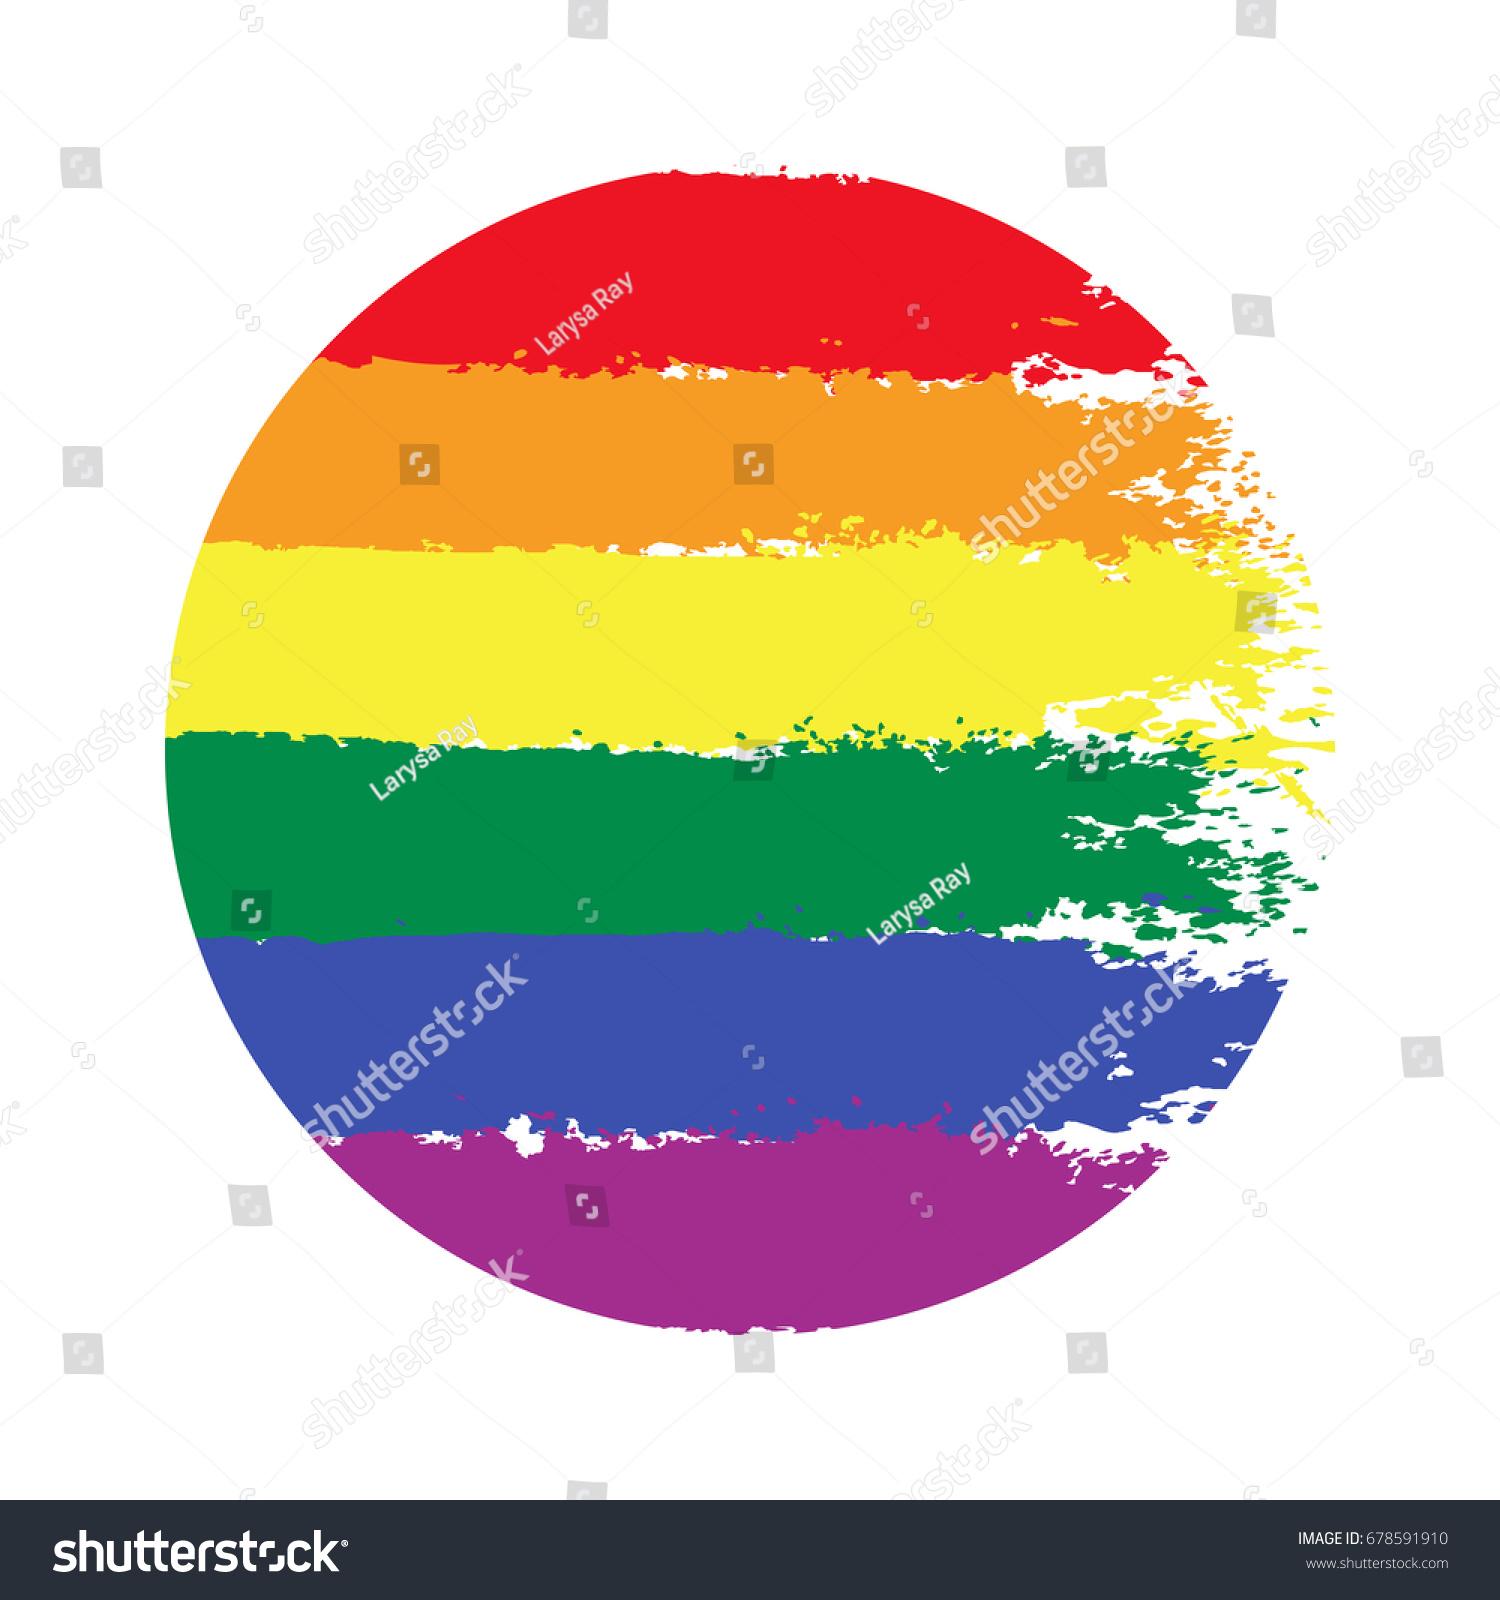 Lgbt gay lesbian pride rainbow texture stock vector 678591910 lgbt gay and lesbian pride rainbow texture vector symbol of gay pride design element buycottarizona